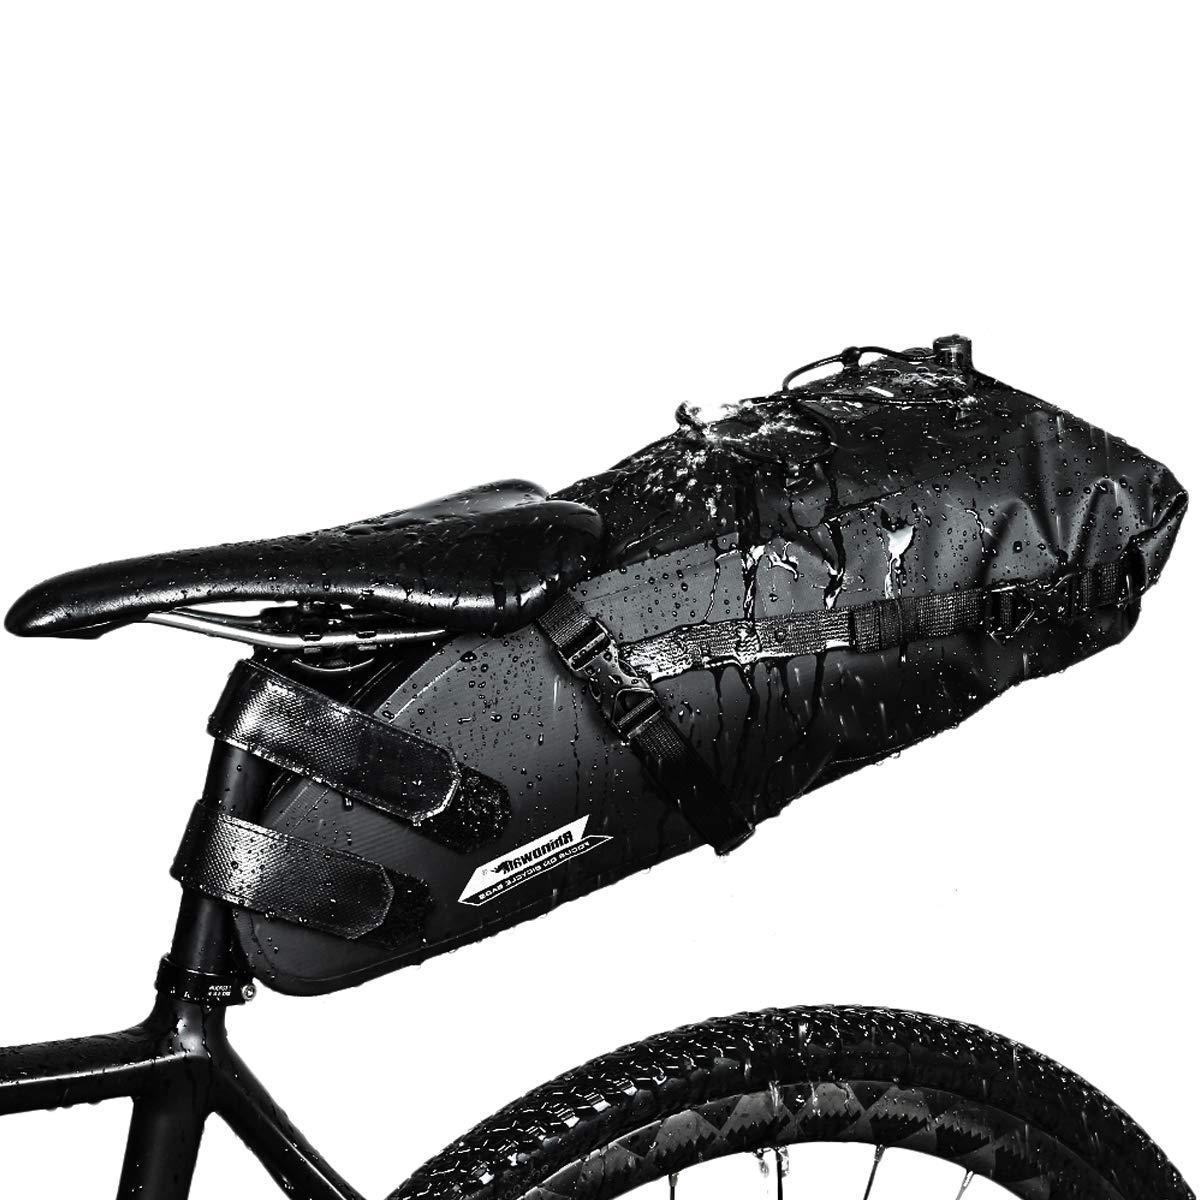 e02a6c856bb Selighting Impermeable Bicicleta Alforja Asiento Trasero Carrier Bolsas de Sillín  Alforjas de Ciclismo product image